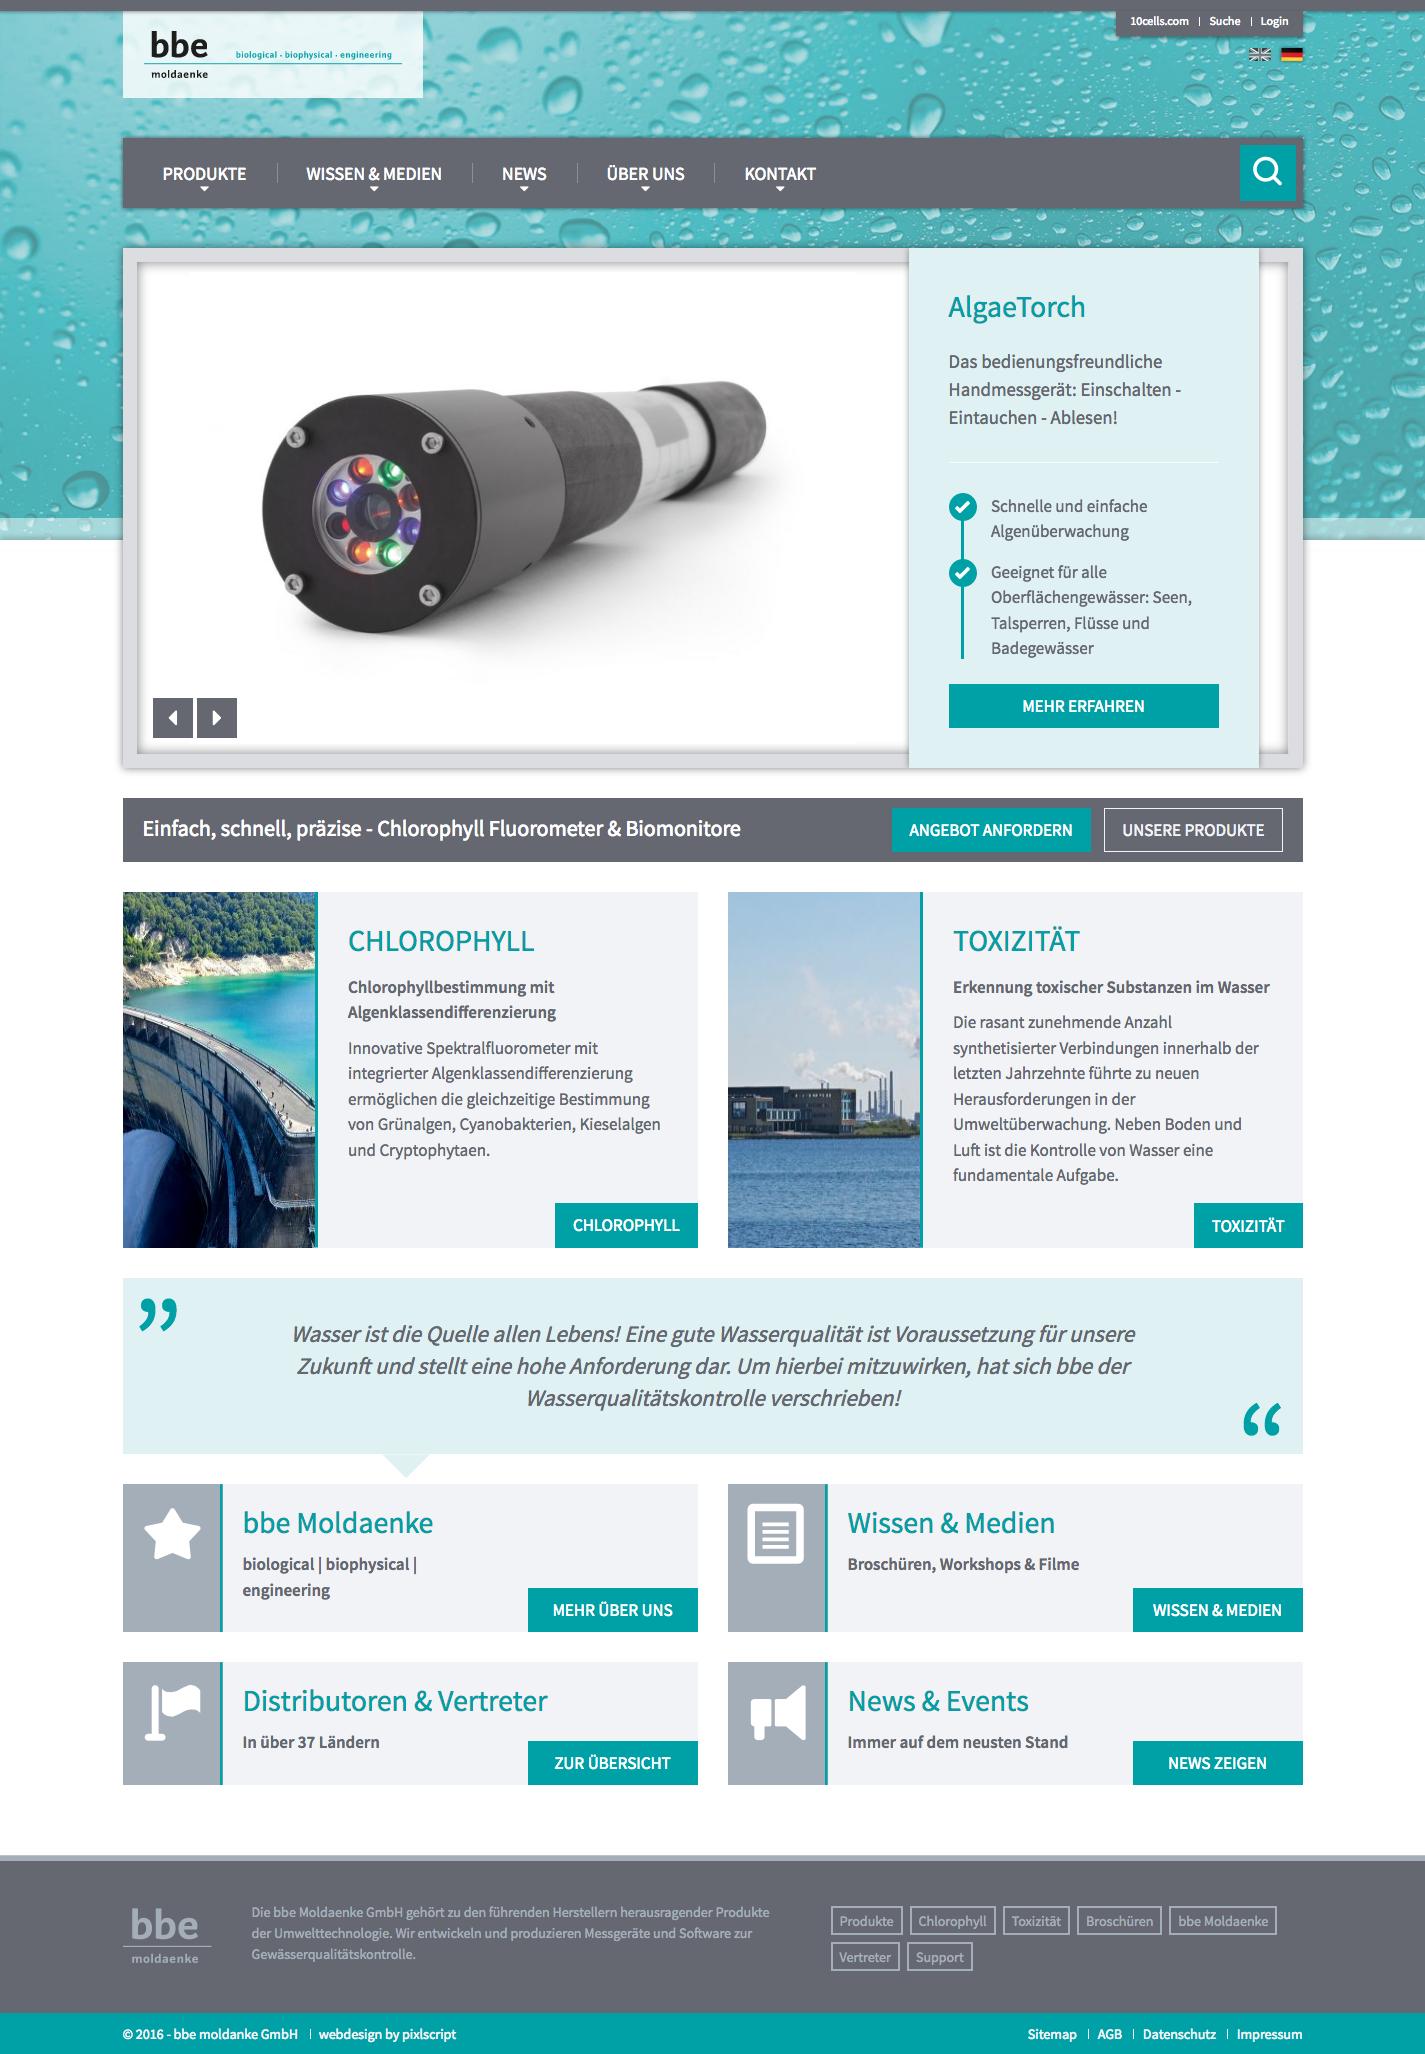 Internationaler Webseiten Relaunch Bbe Moldaenke Gmbh